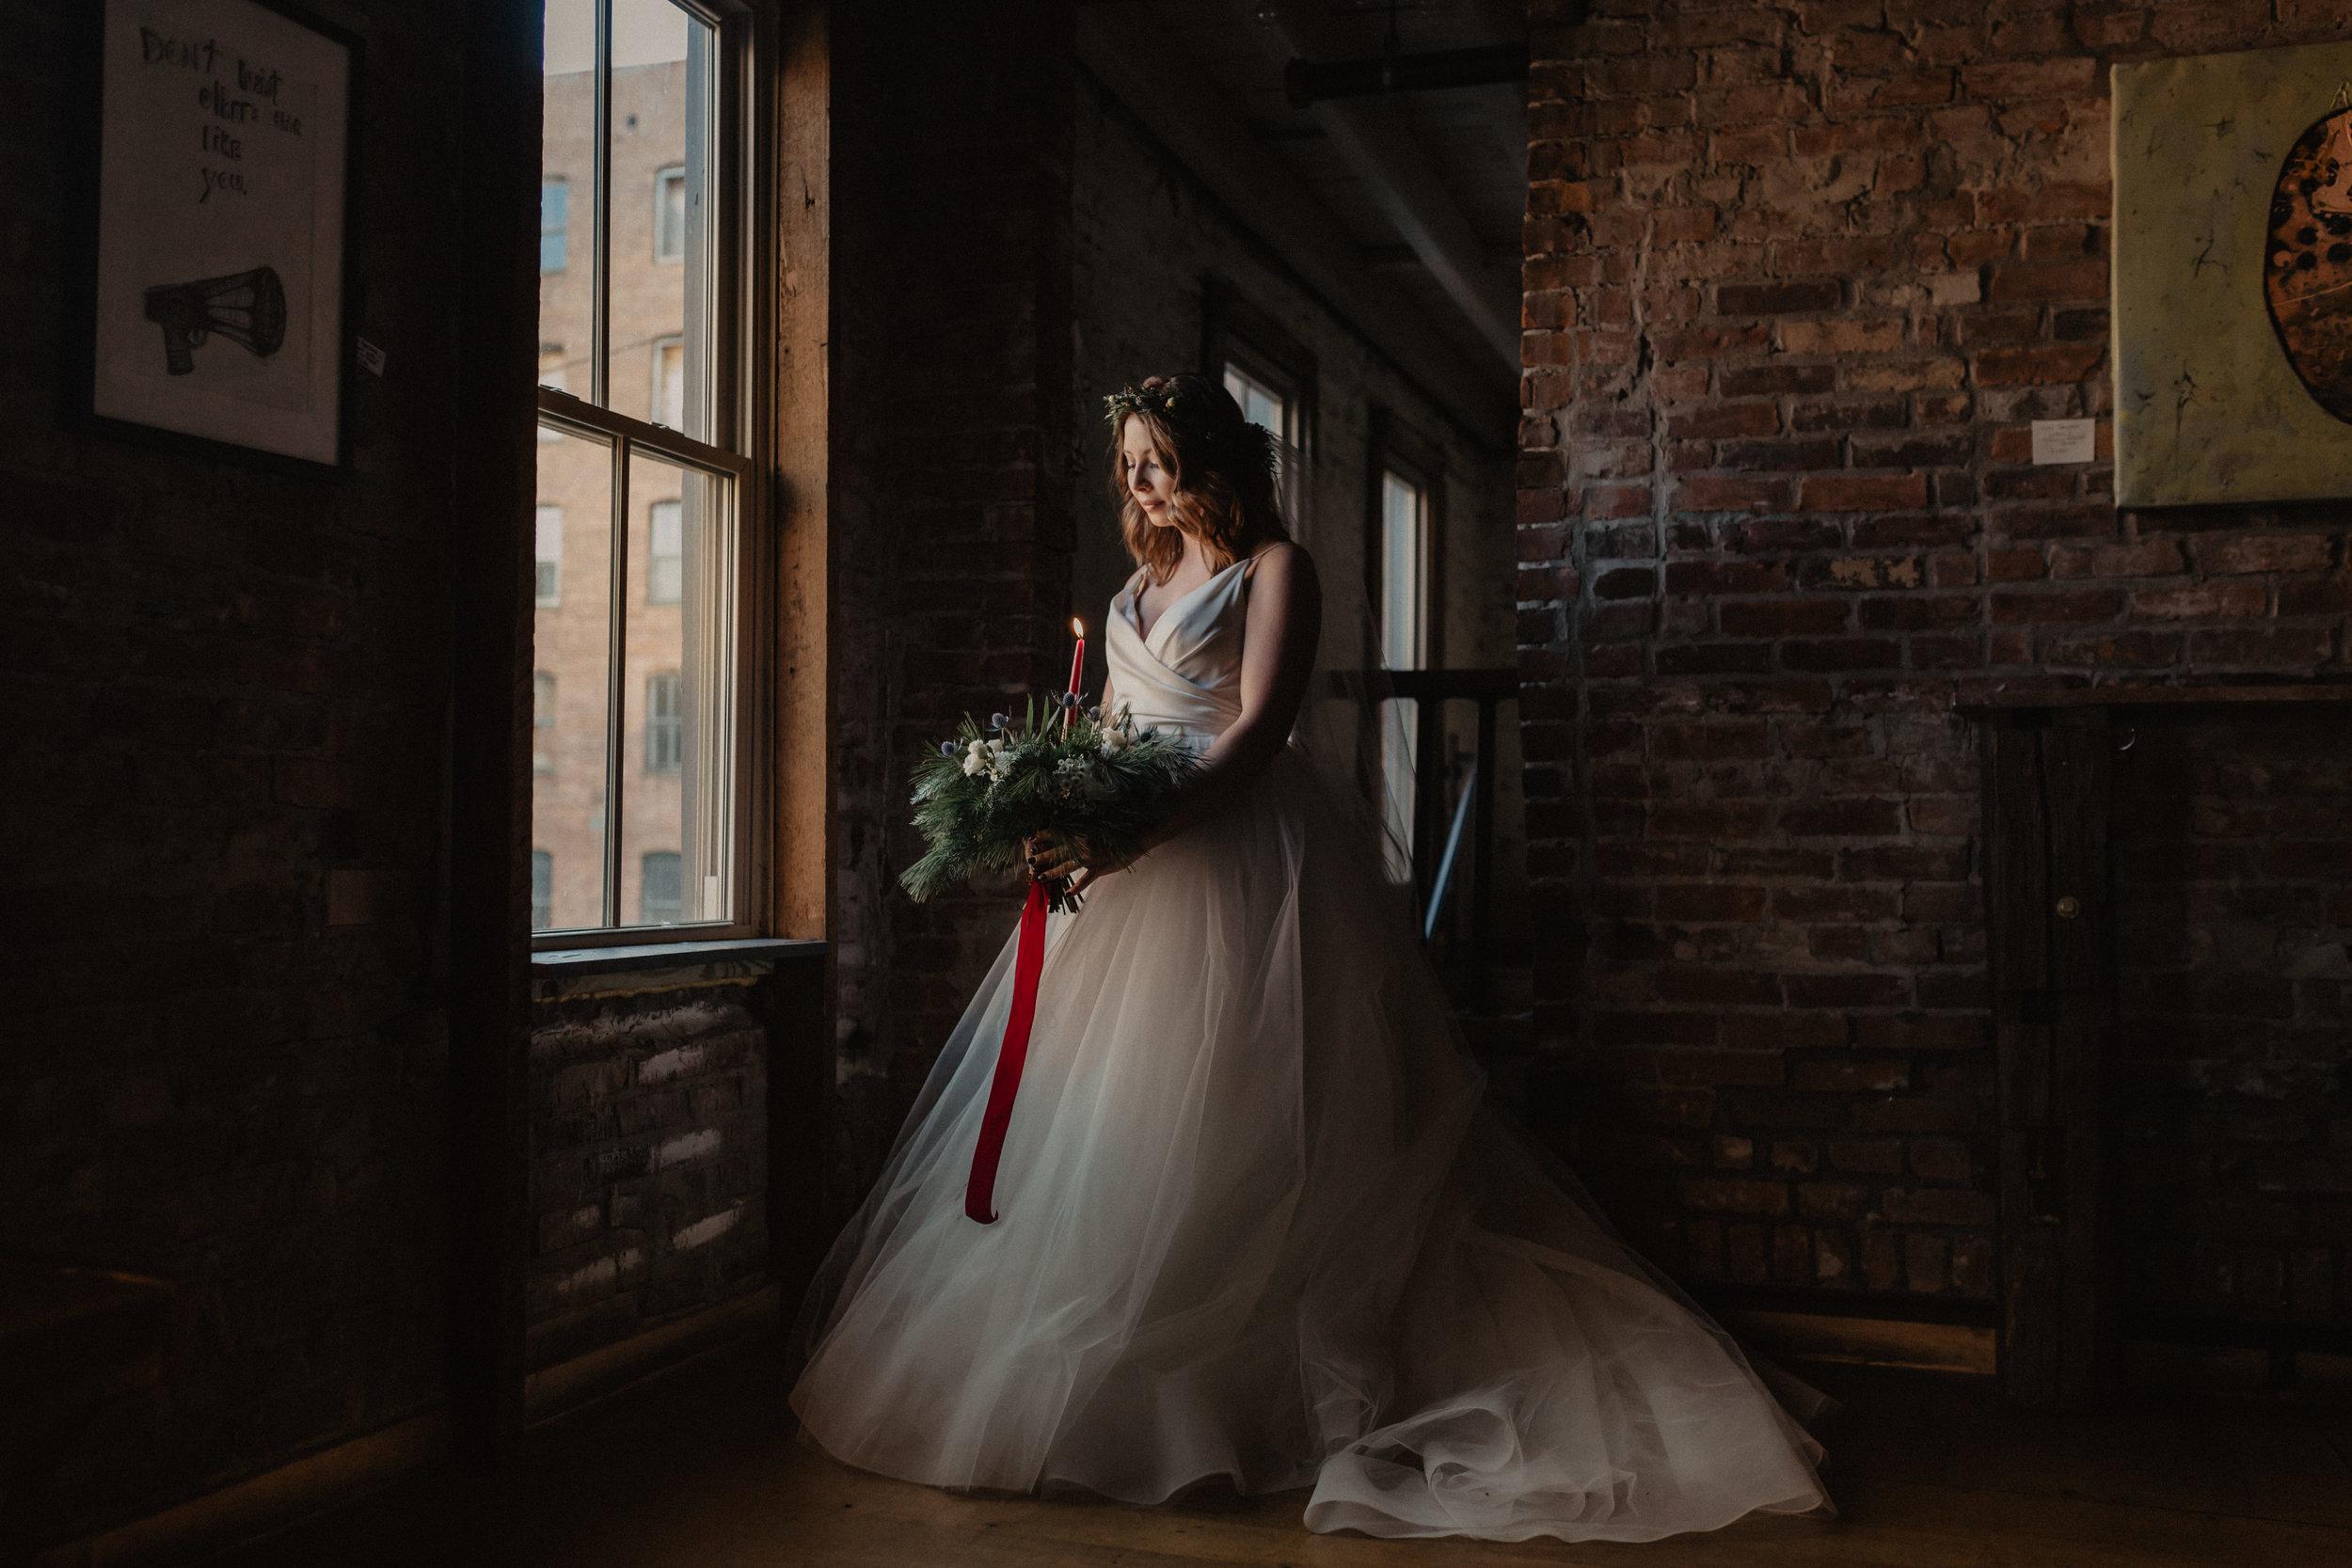 lucas_confectionery_wedding-53.jpg